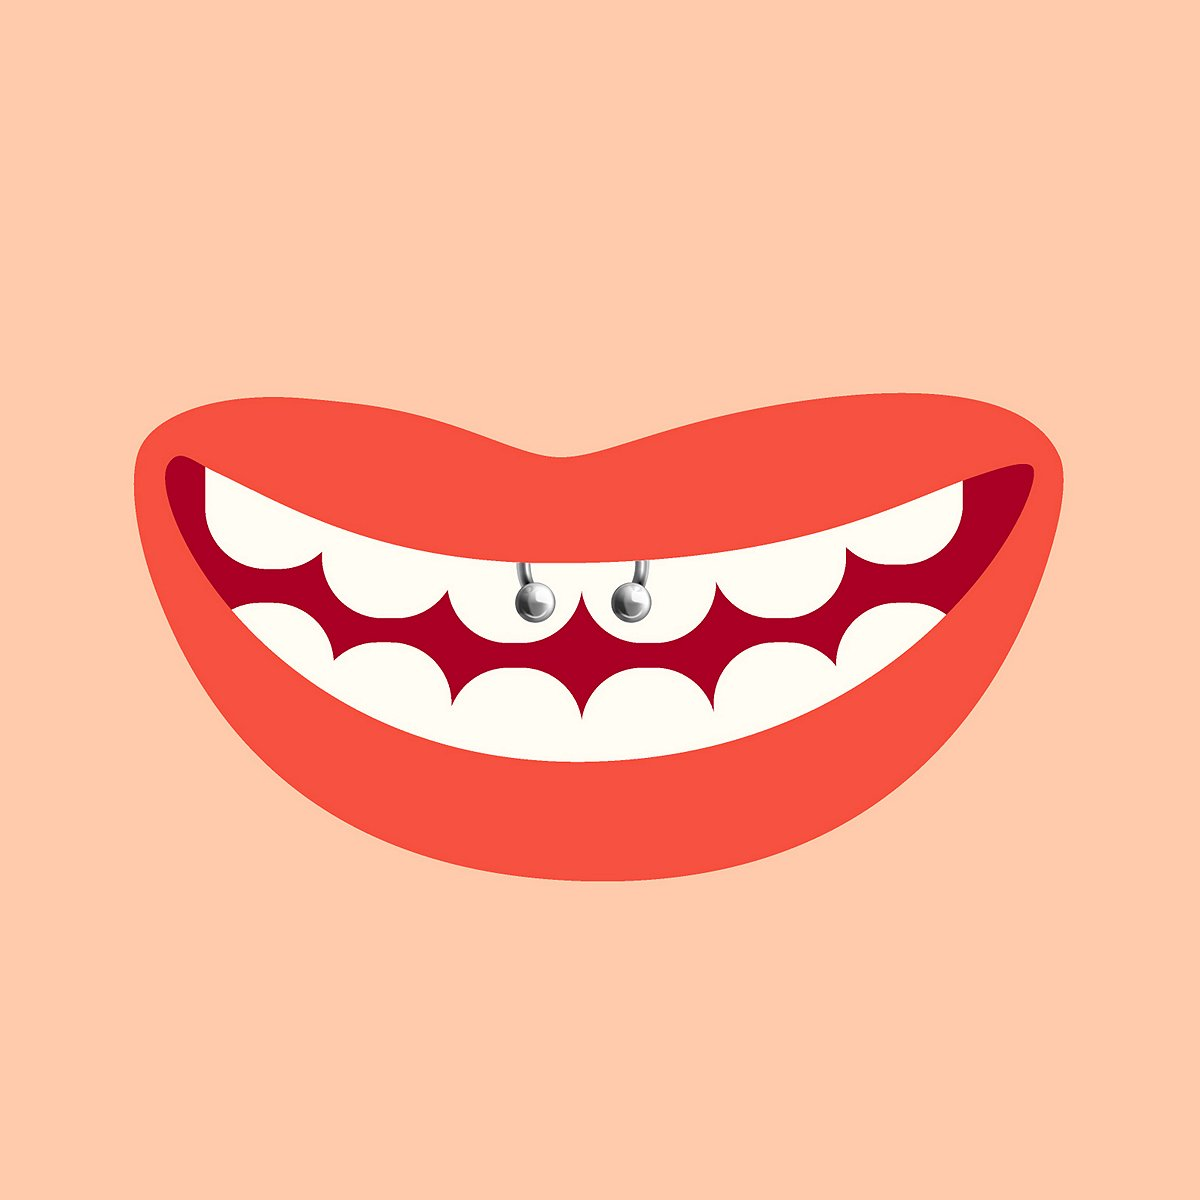 Lip Frenulum Piercing (Smiley Piercing)